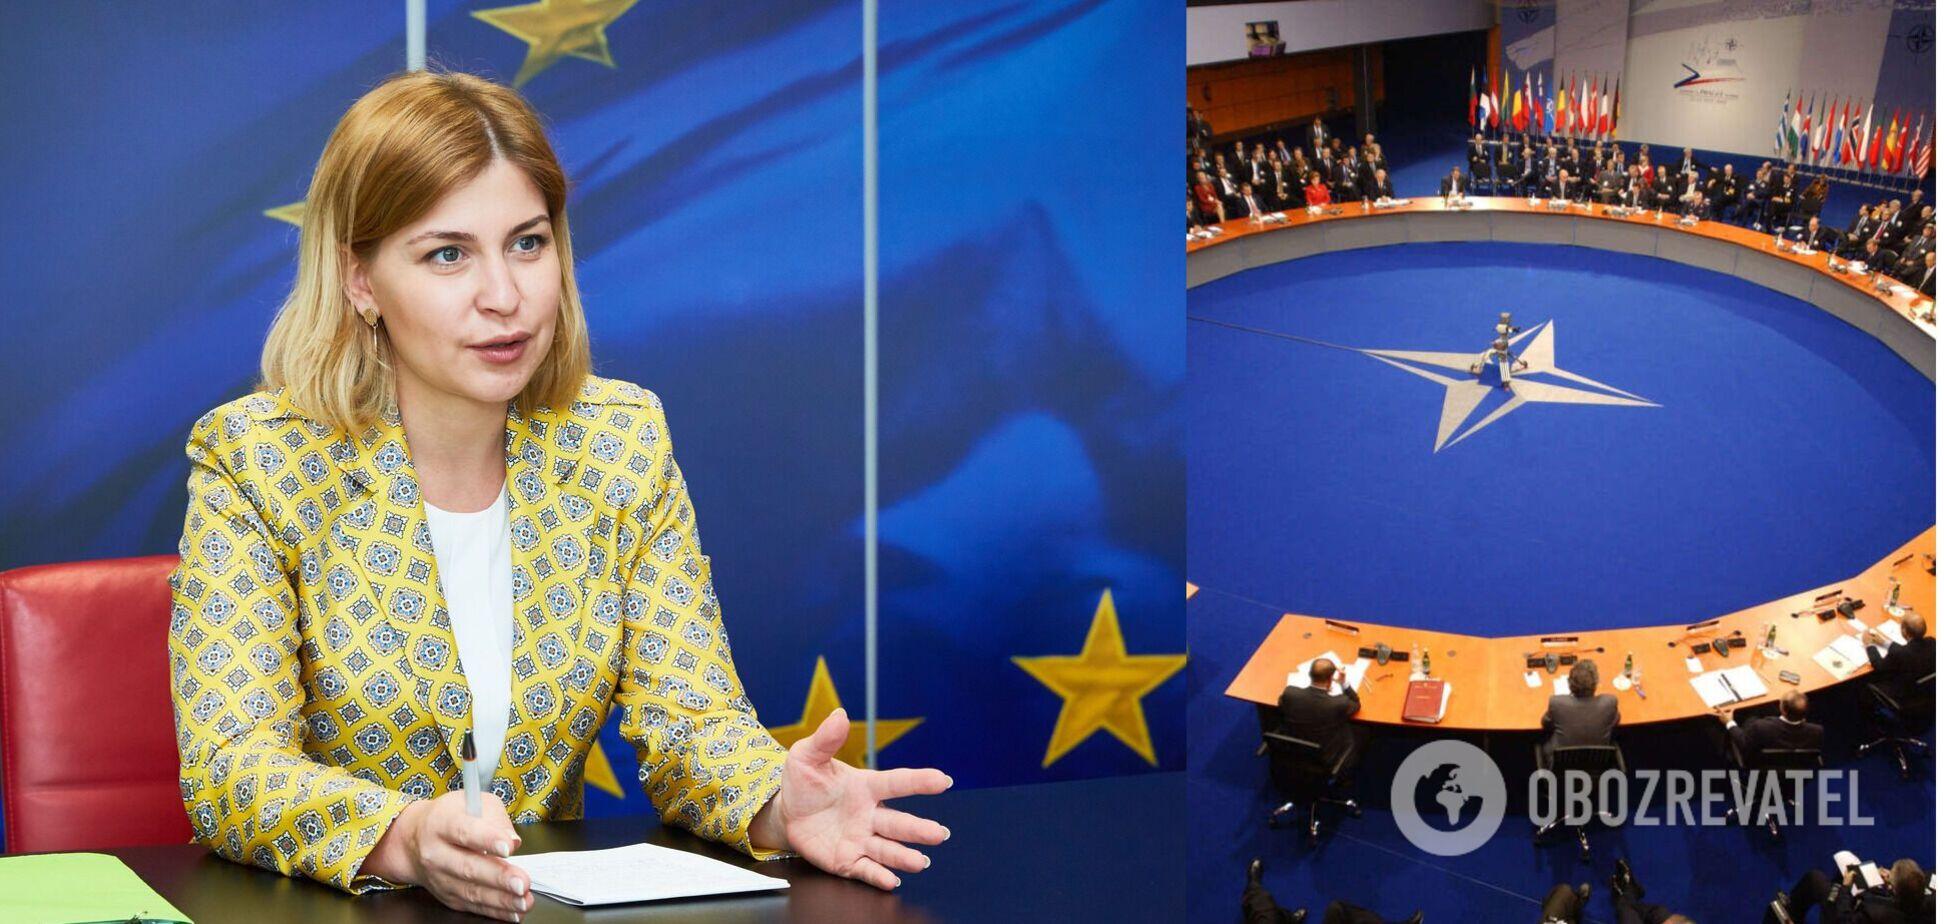 Стефанішина пояснила, чому Україну не покликали на саміт НАТО